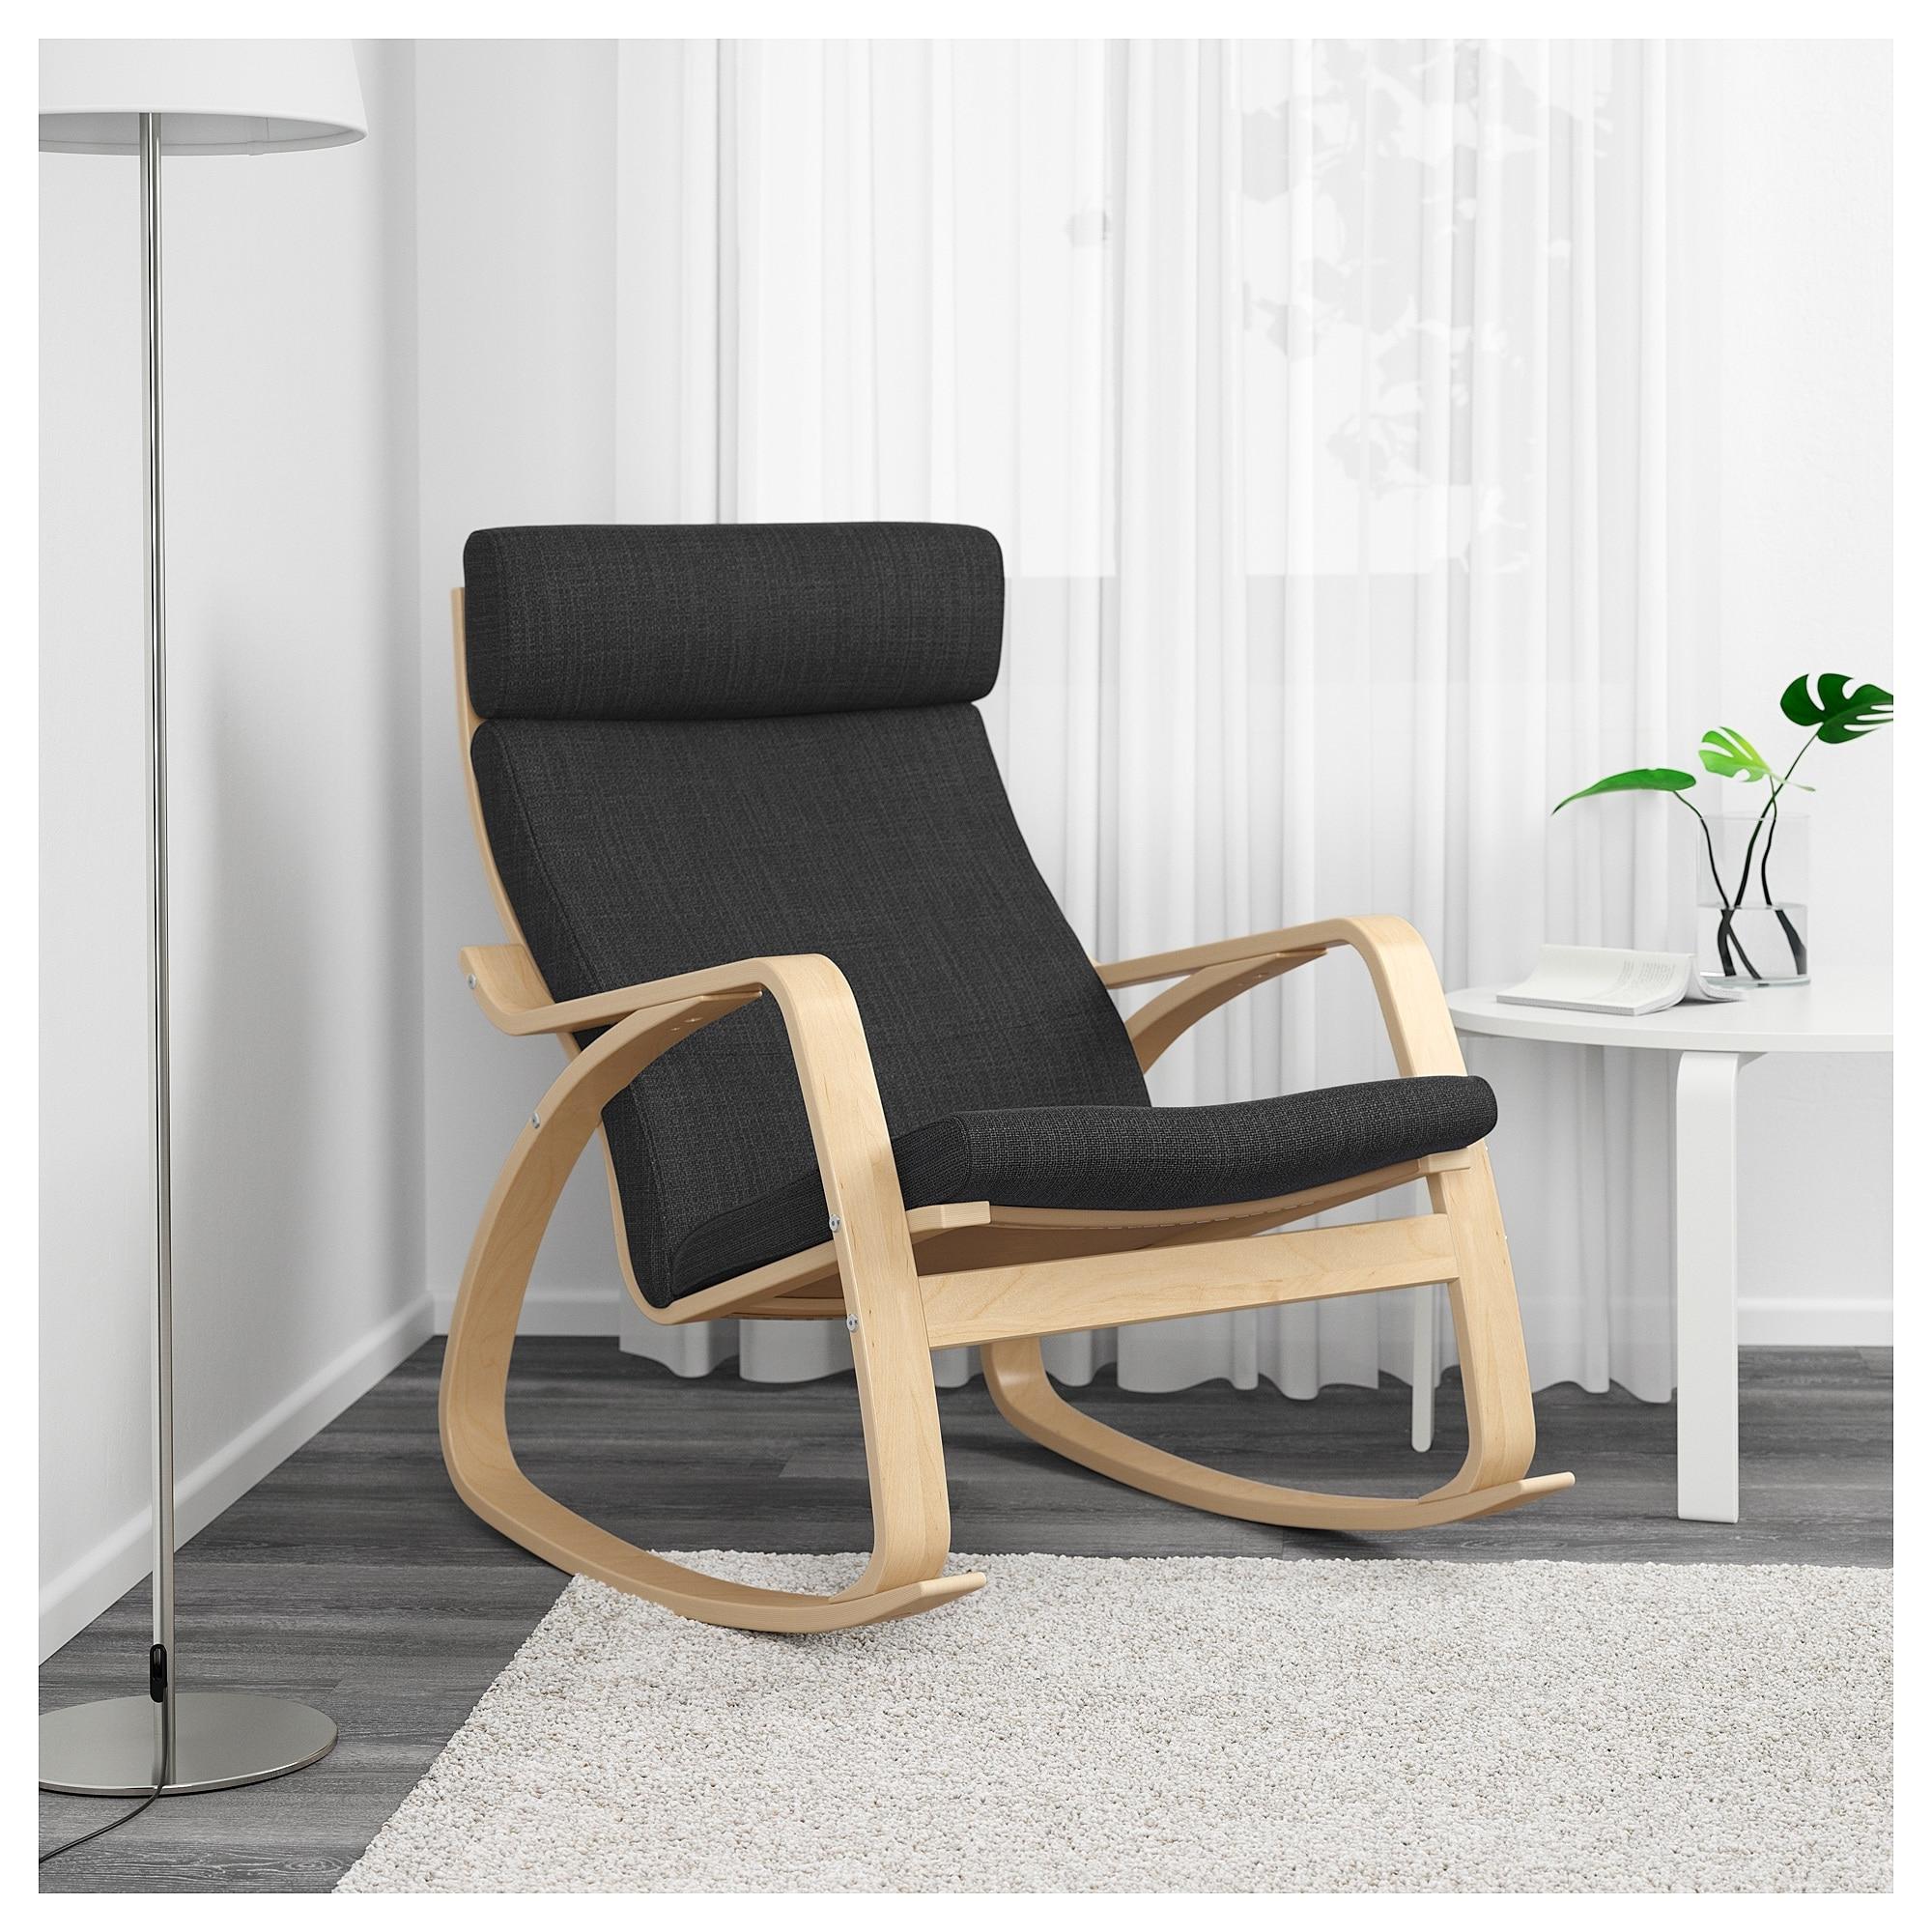 Rocking Chairs At Ikea Regarding 2019 Poäng Rocking Chair Birch Veneer/hillared Anthracite – Ikea (View 18 of 20)